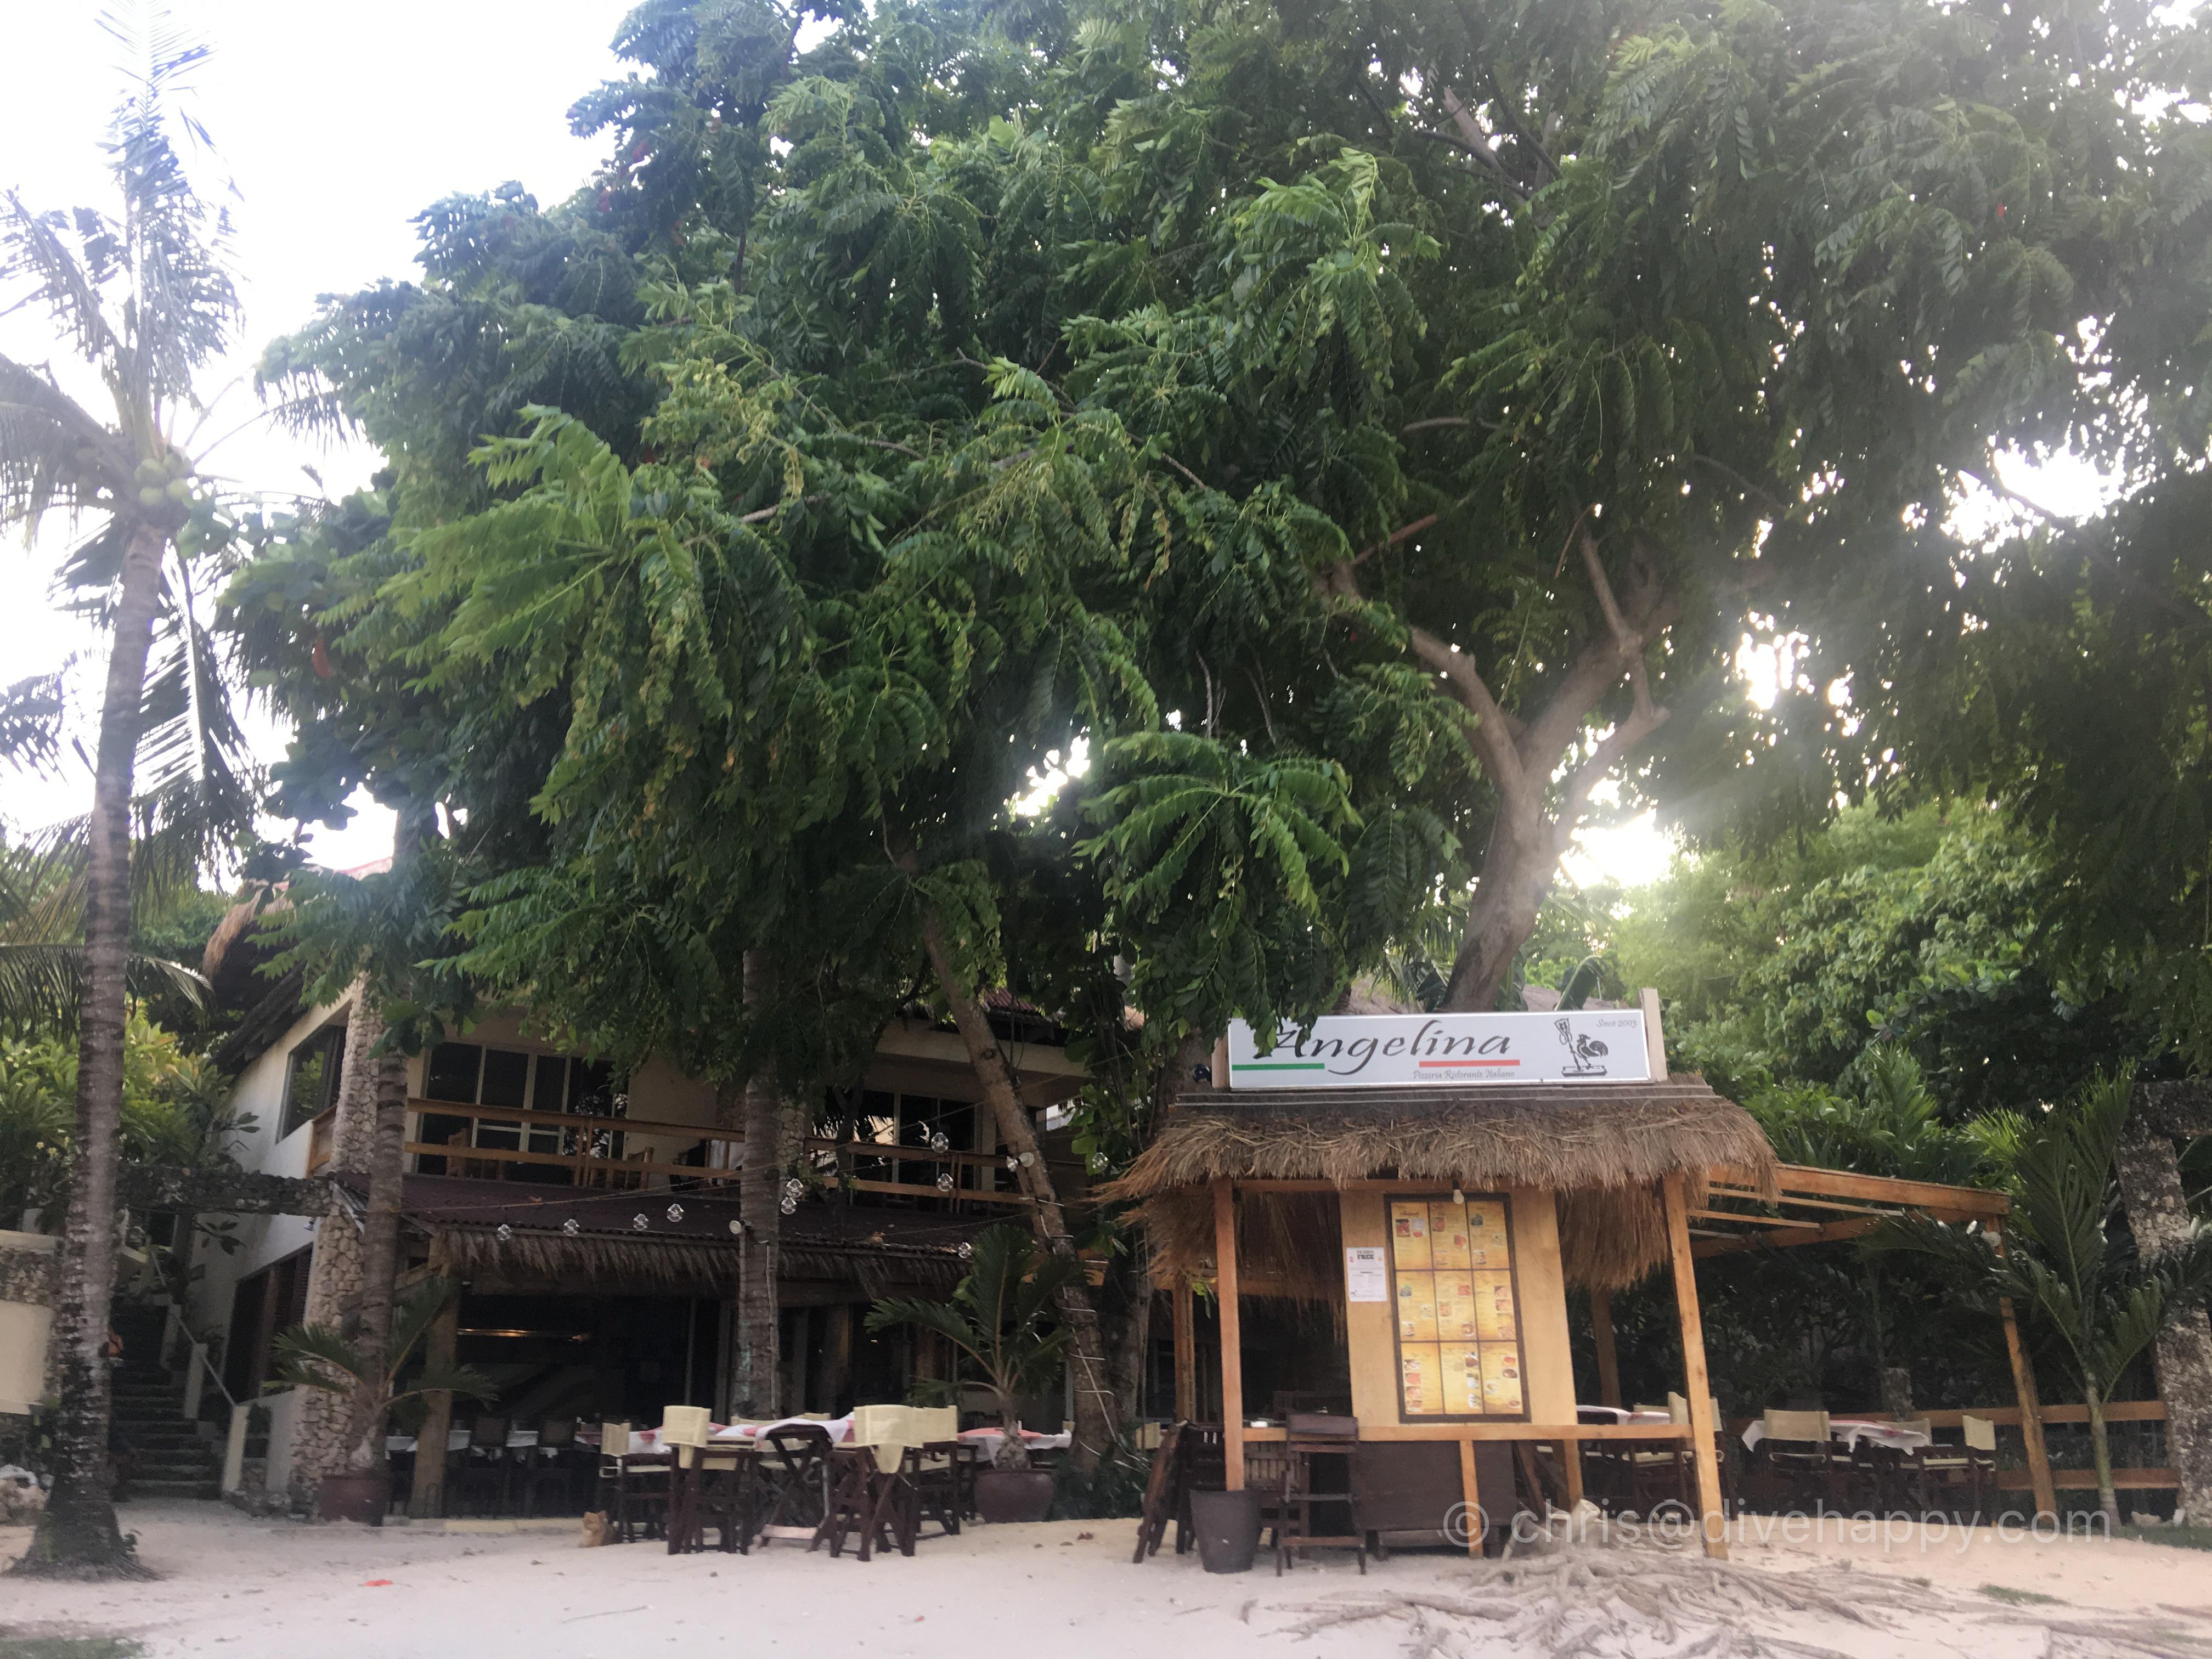 Angelina restaurant, Malapascua